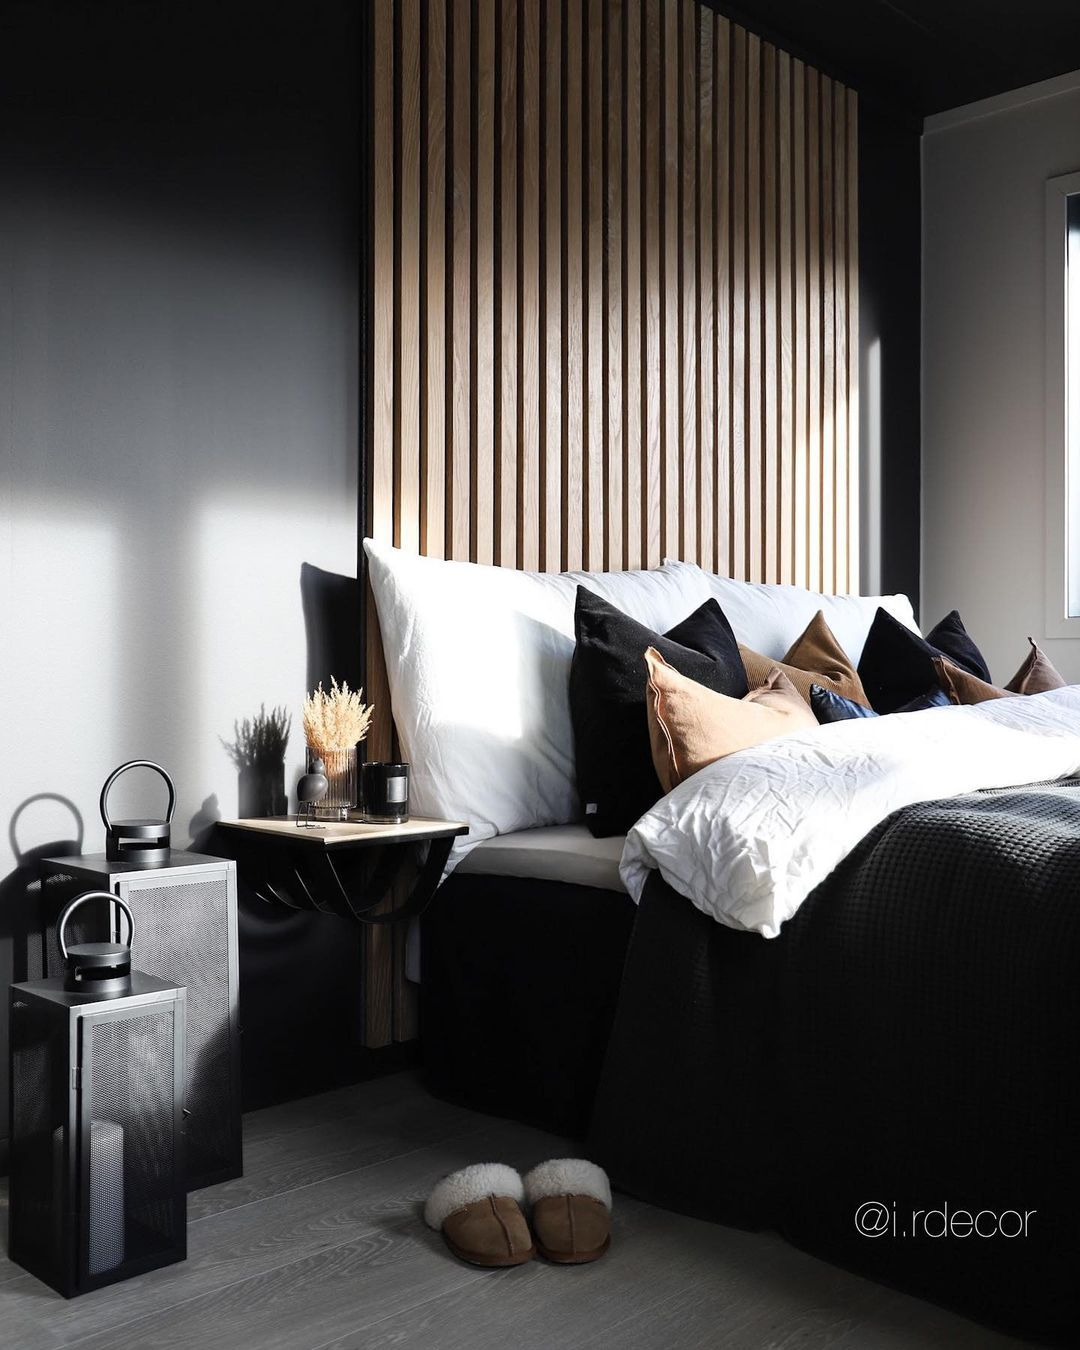 #bedroom #bedroominspiration #home #homedecor #decor